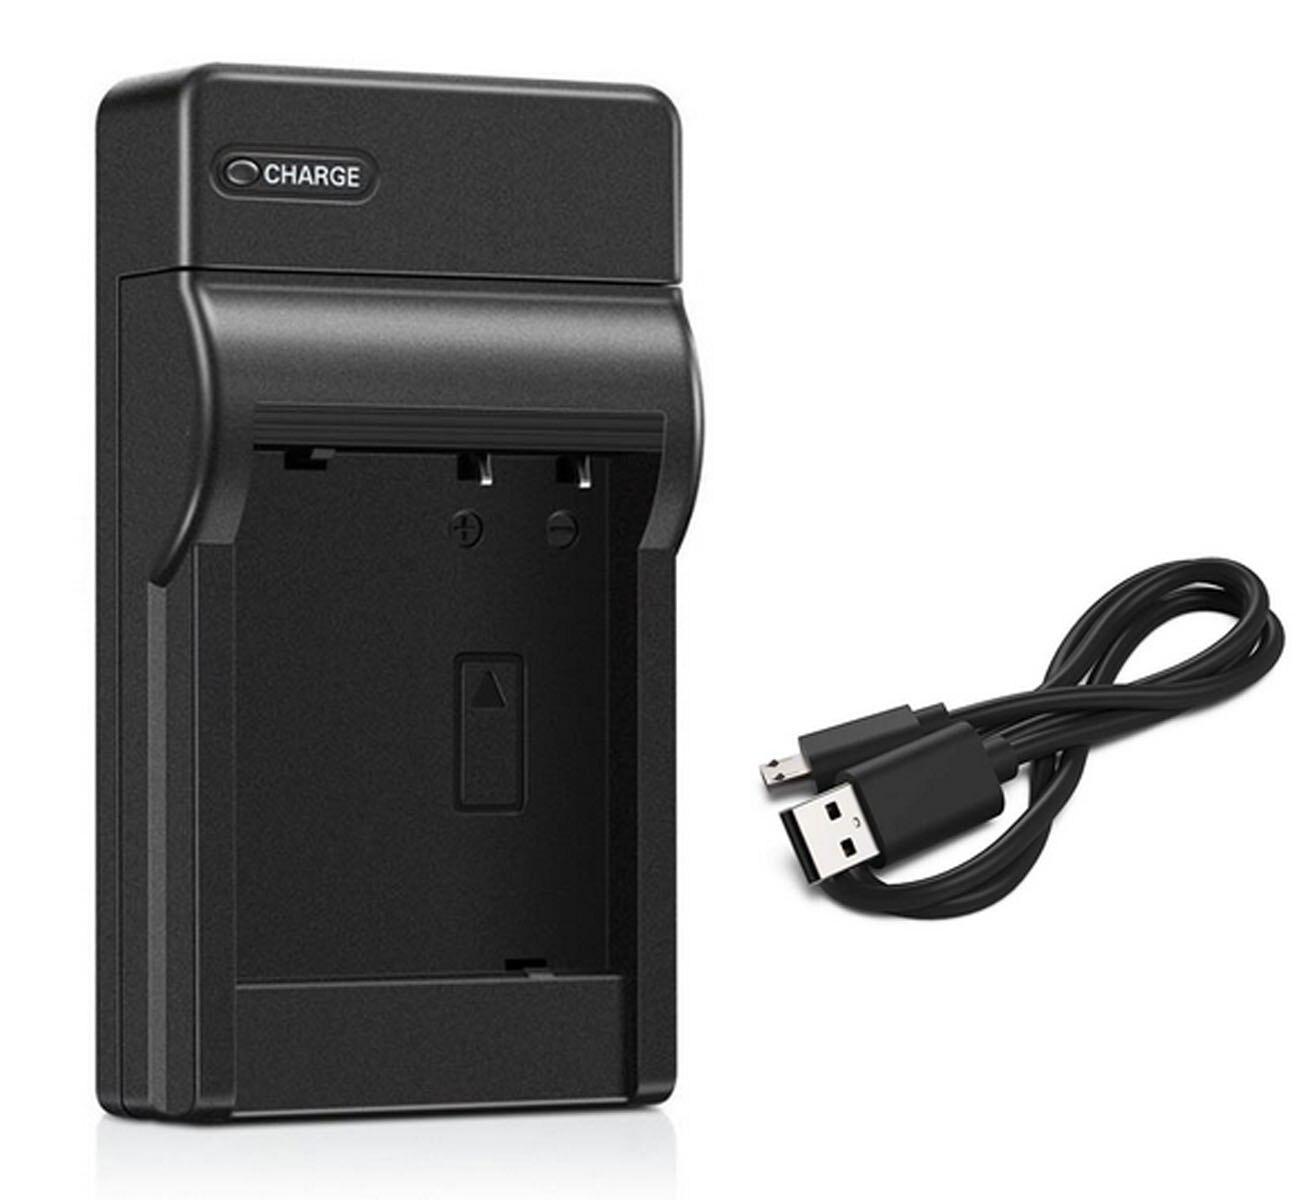 Cargador de batería para cámara Digital Sony Alpha ILCE-3000, ILCE-3500, ILCE-5000,ILCE-5100,ILCE-6000,ILCE-6300,ILCE-6500